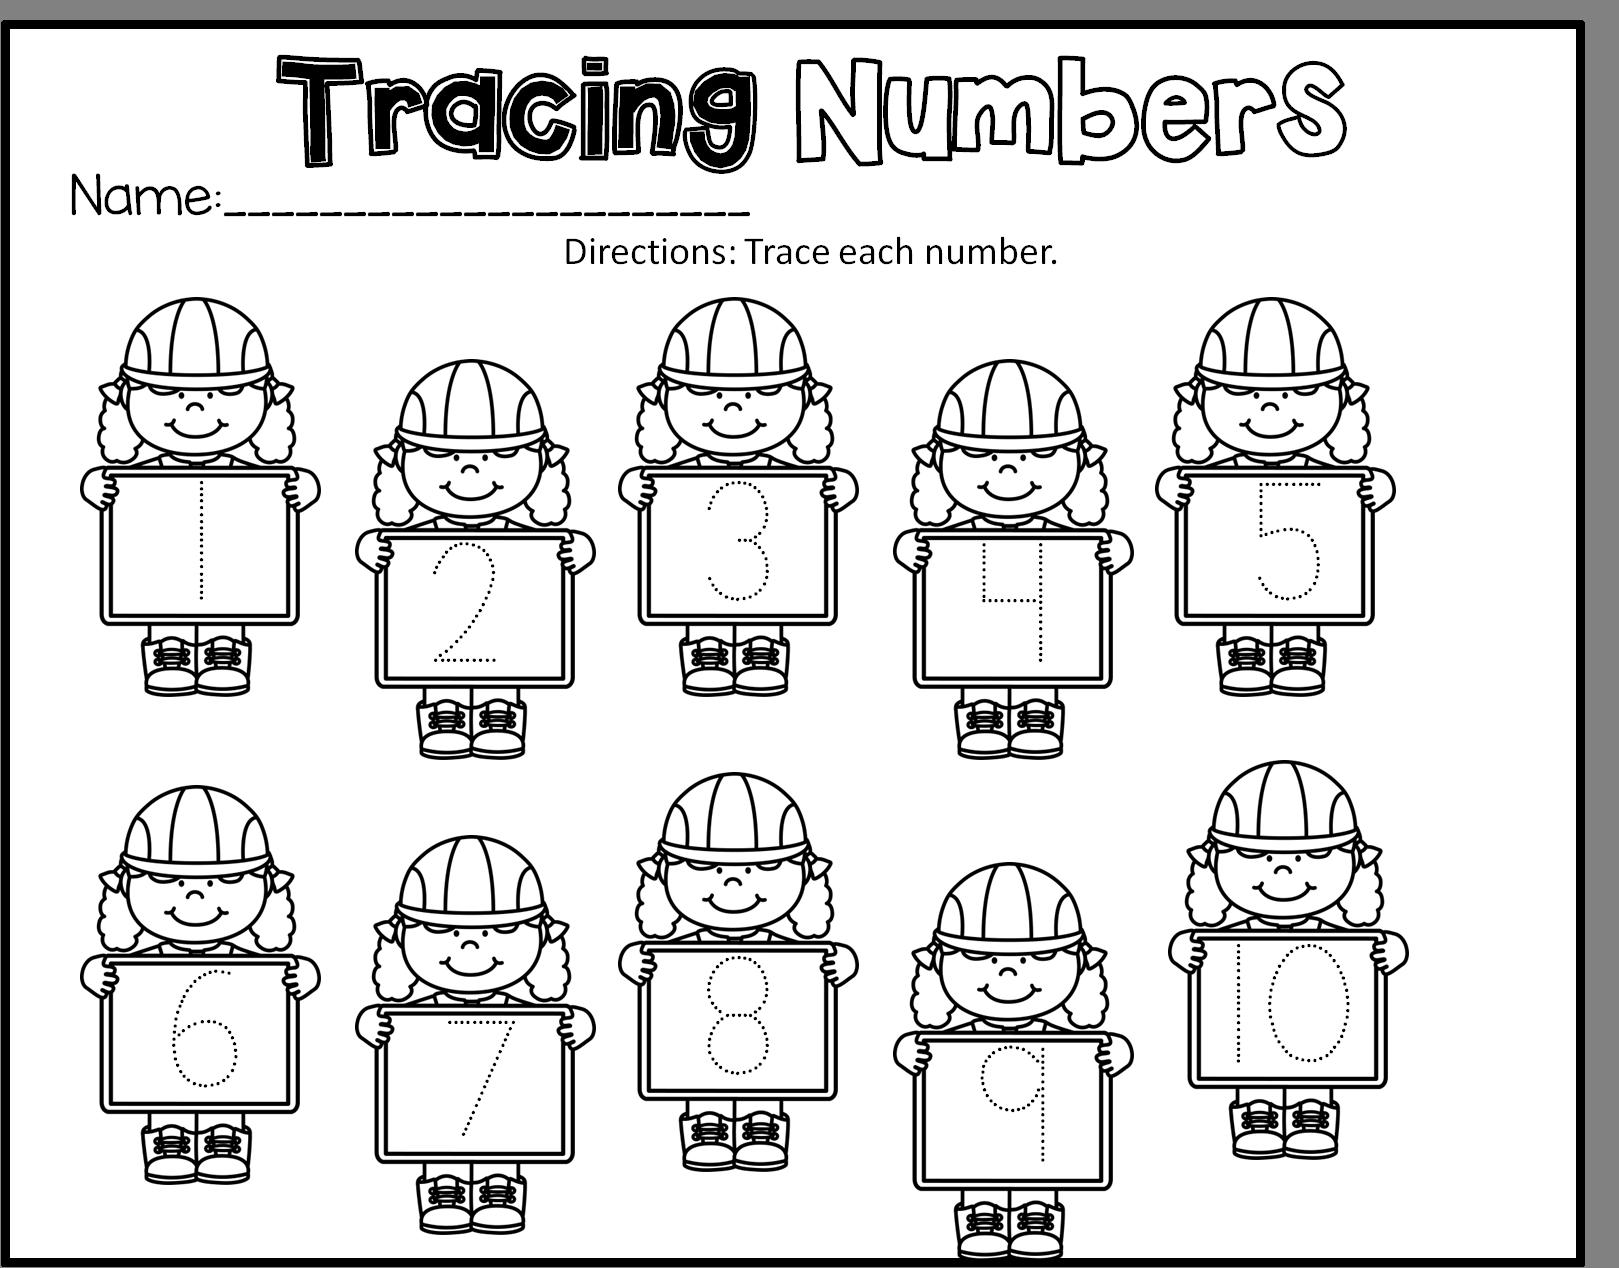 Construction Preschool Math Literacy And Writing Pack Preschool Construction Construction Theme Preschool Construction Theme Classroom